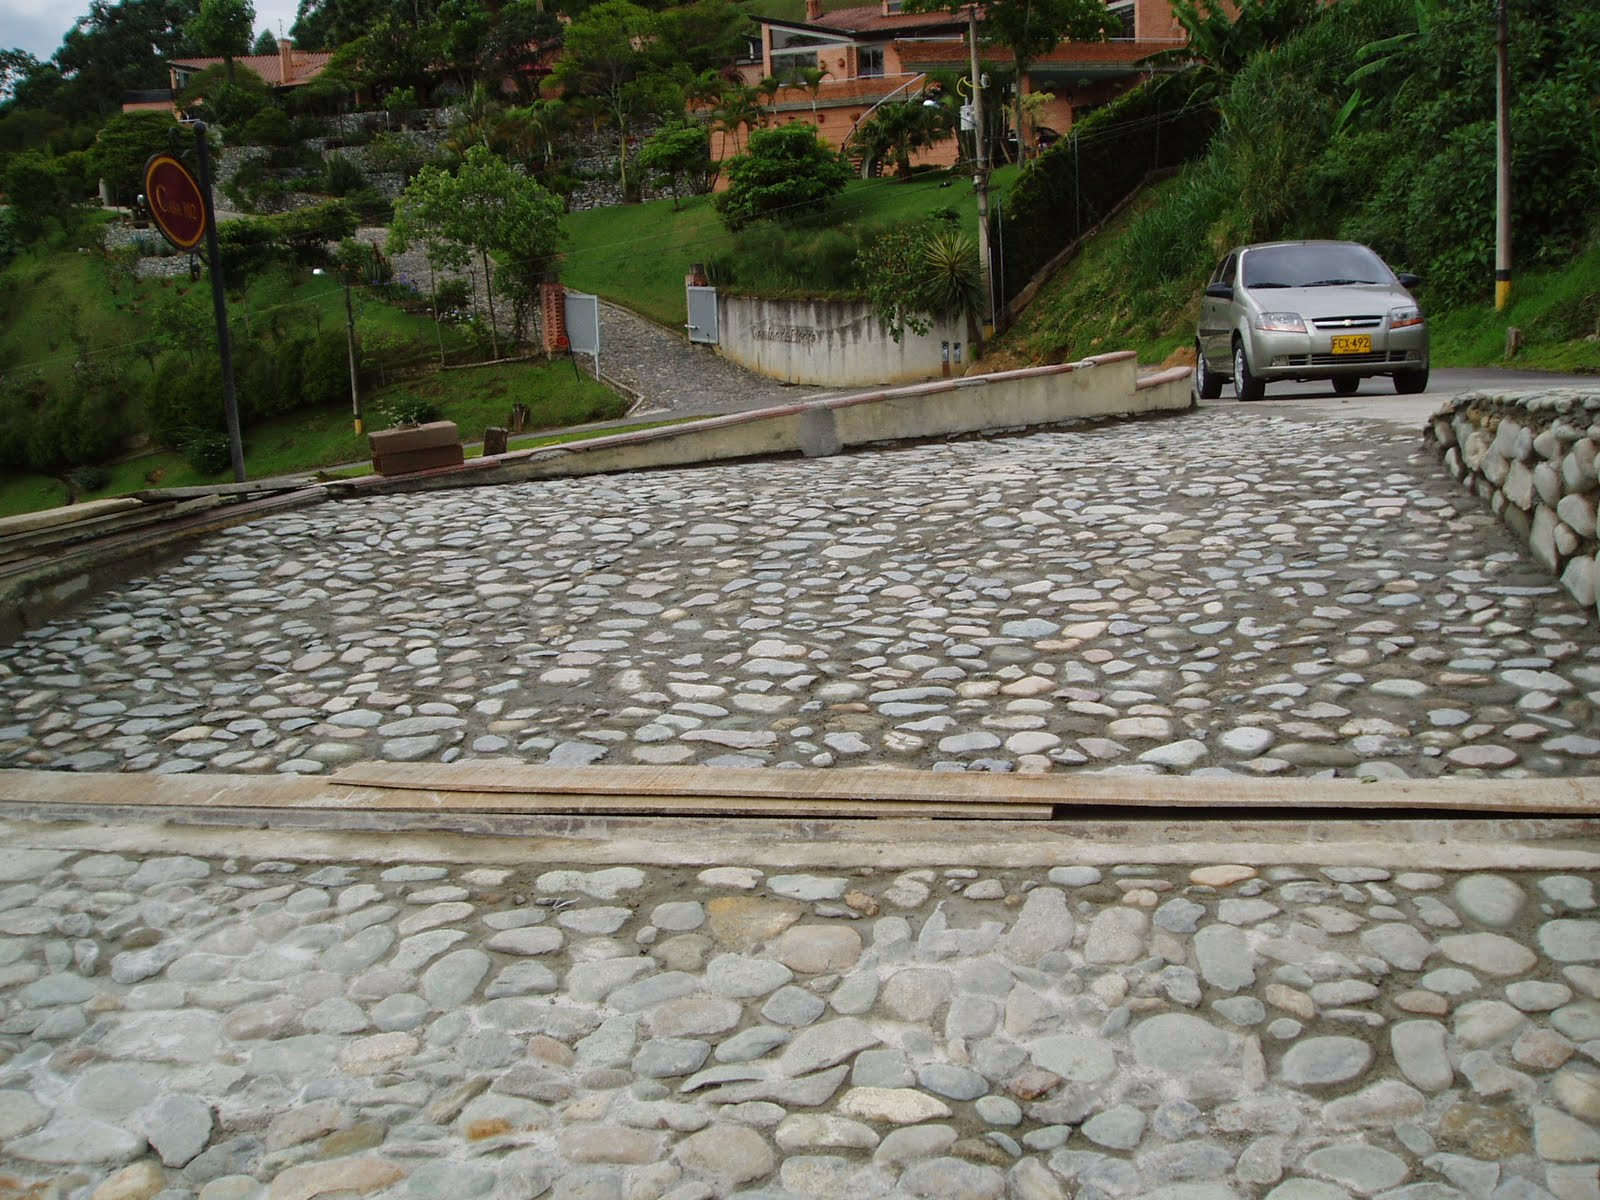 Piso piedra imagui for Entradas de pisos